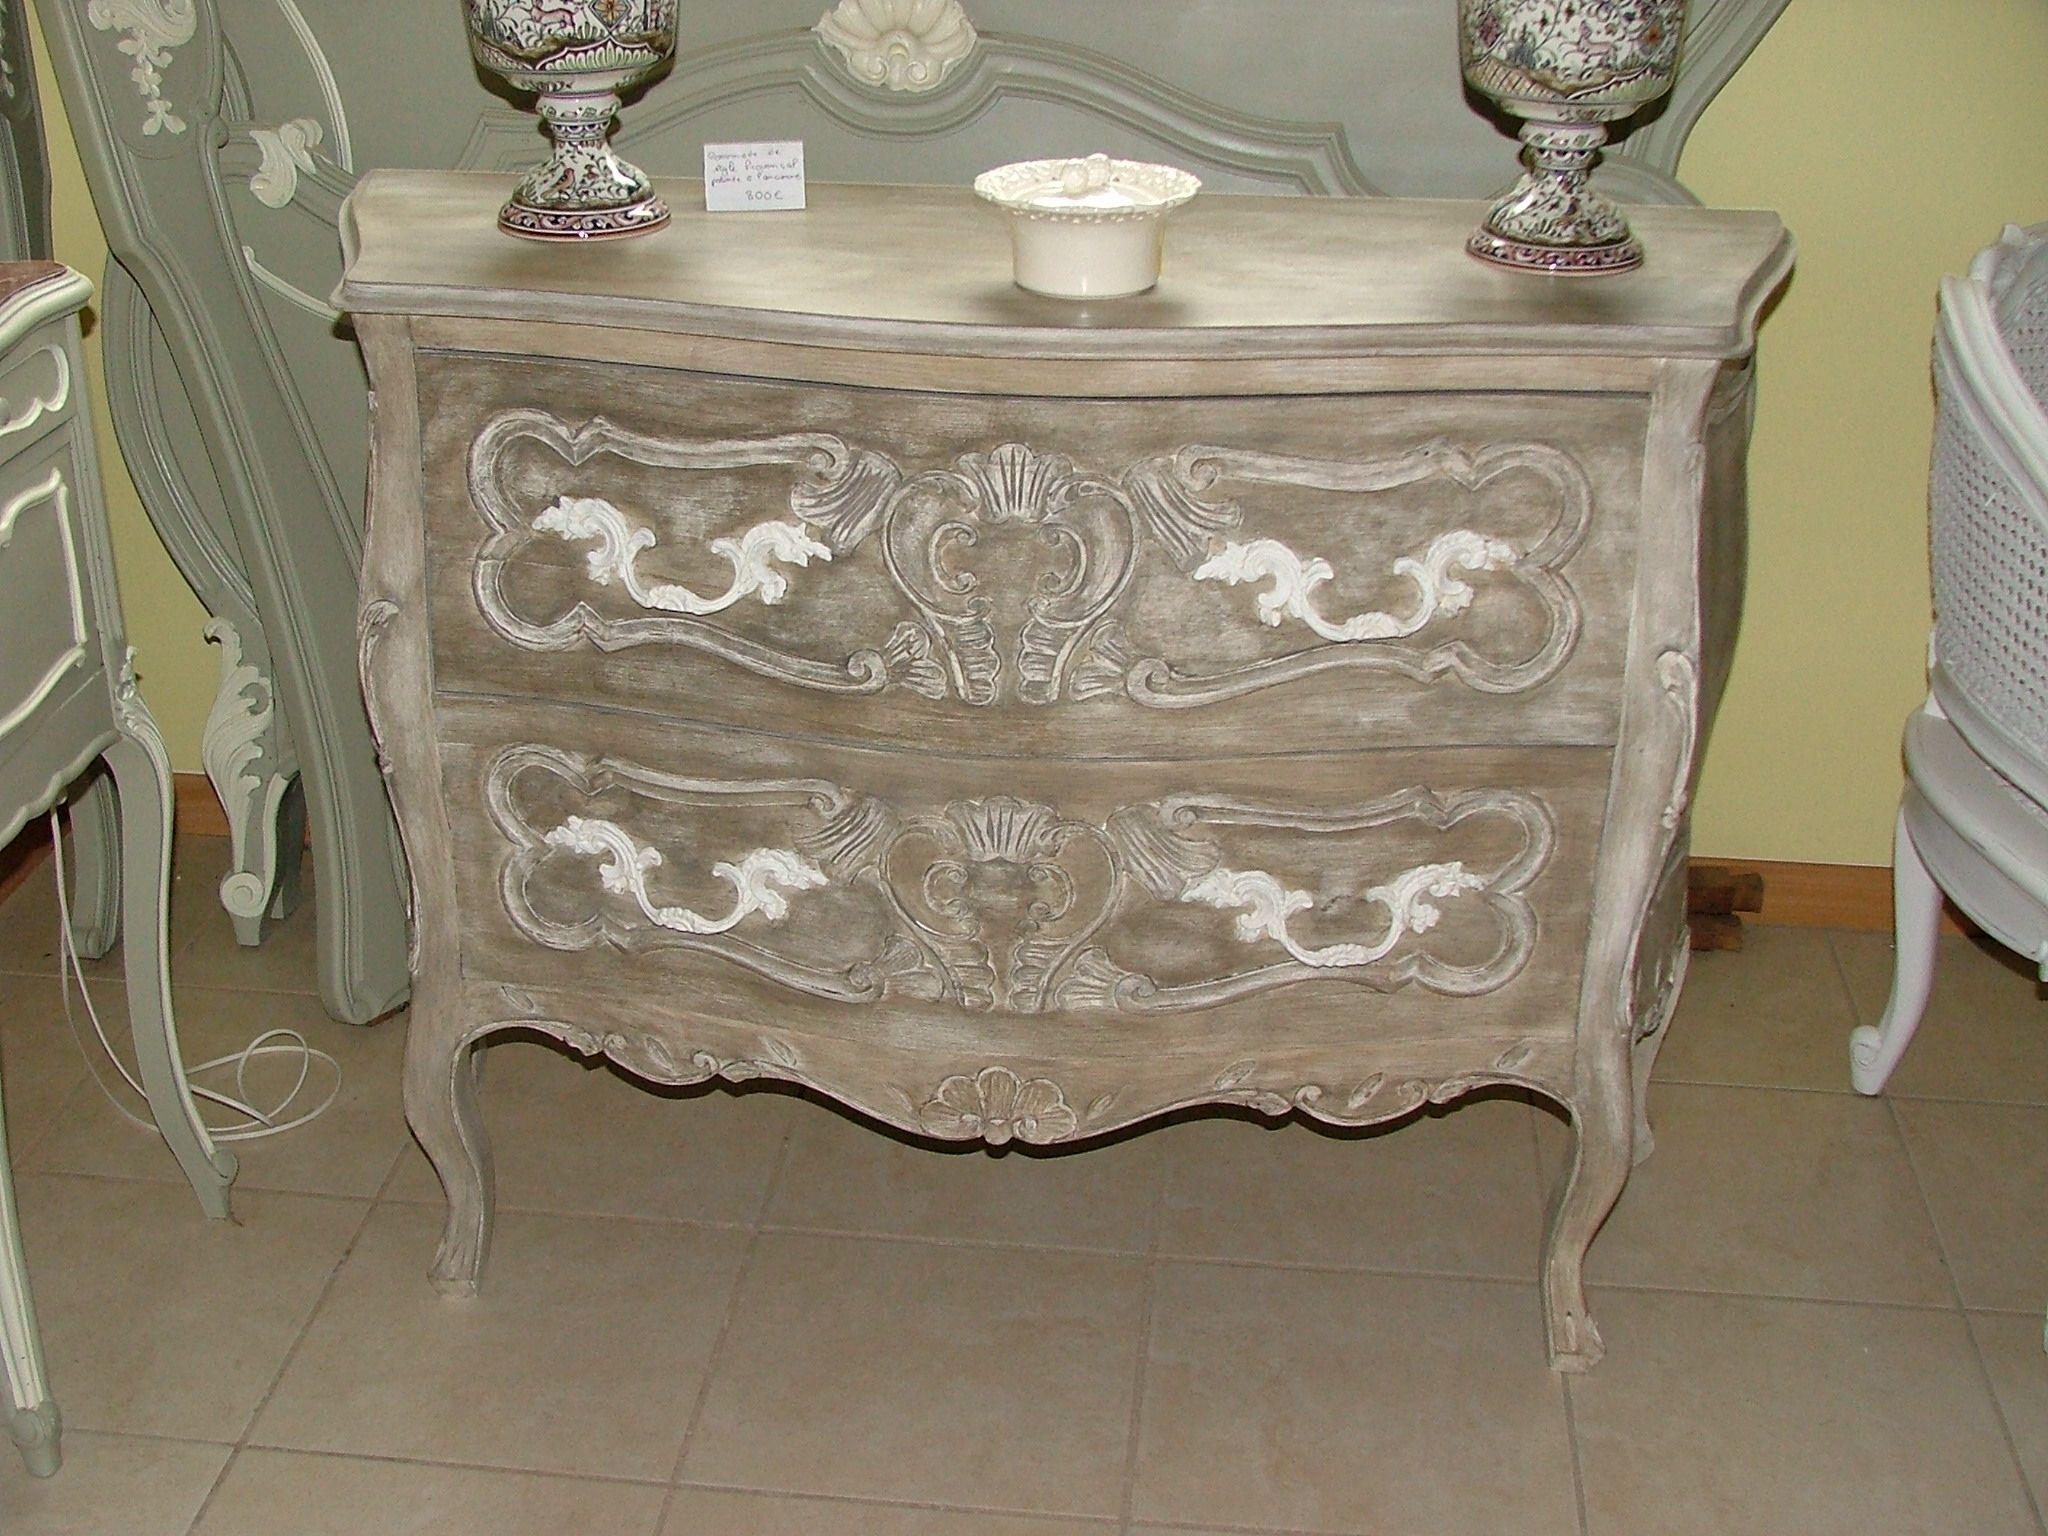 meubles patin s style gustavien boutique douceur gustavienne commodes pinterest meuble. Black Bedroom Furniture Sets. Home Design Ideas